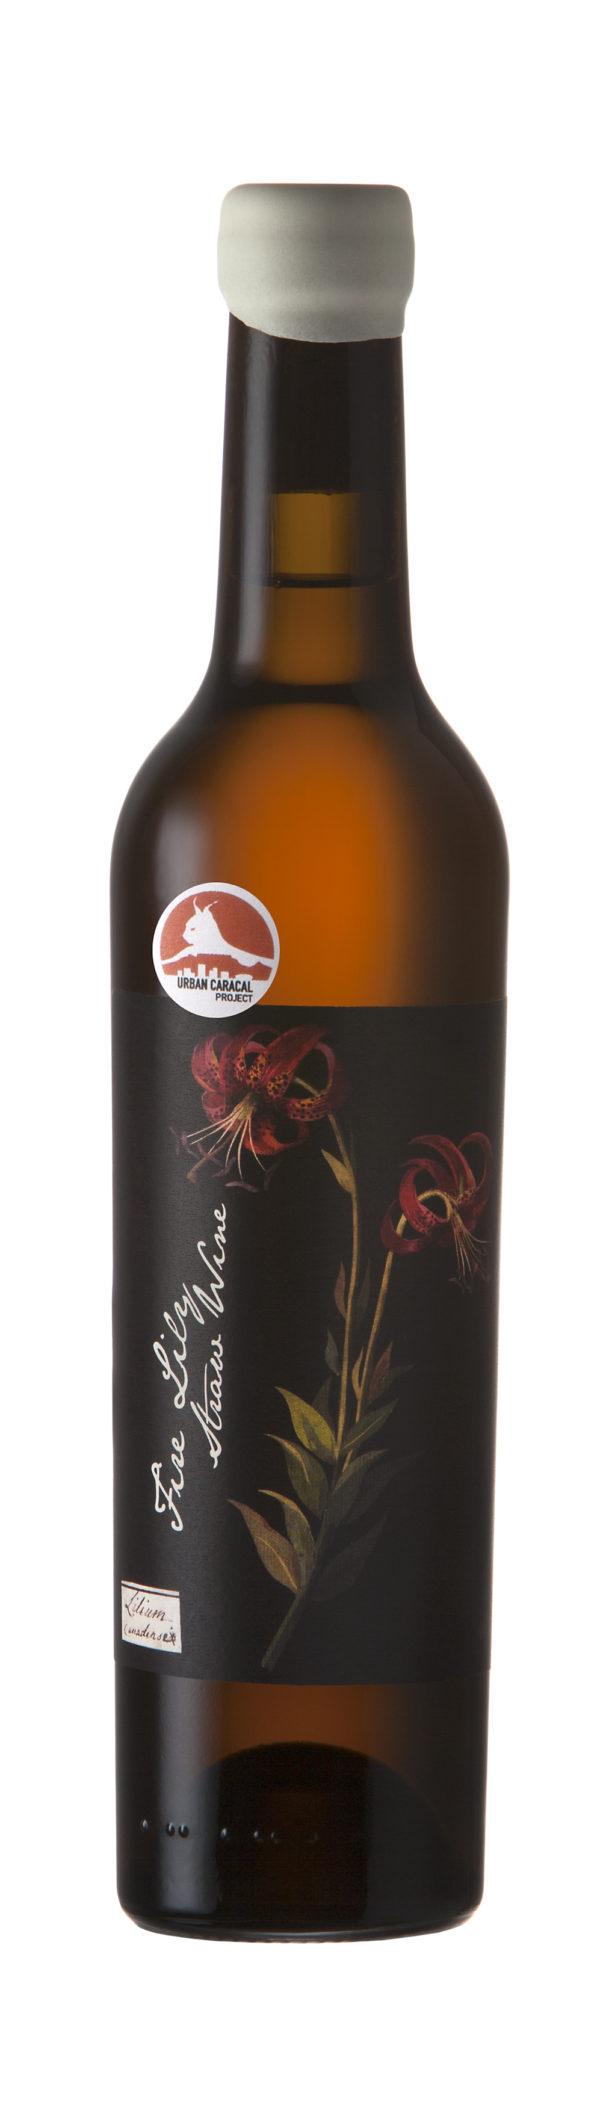 Botanica Fire Lily Straw Wine NV